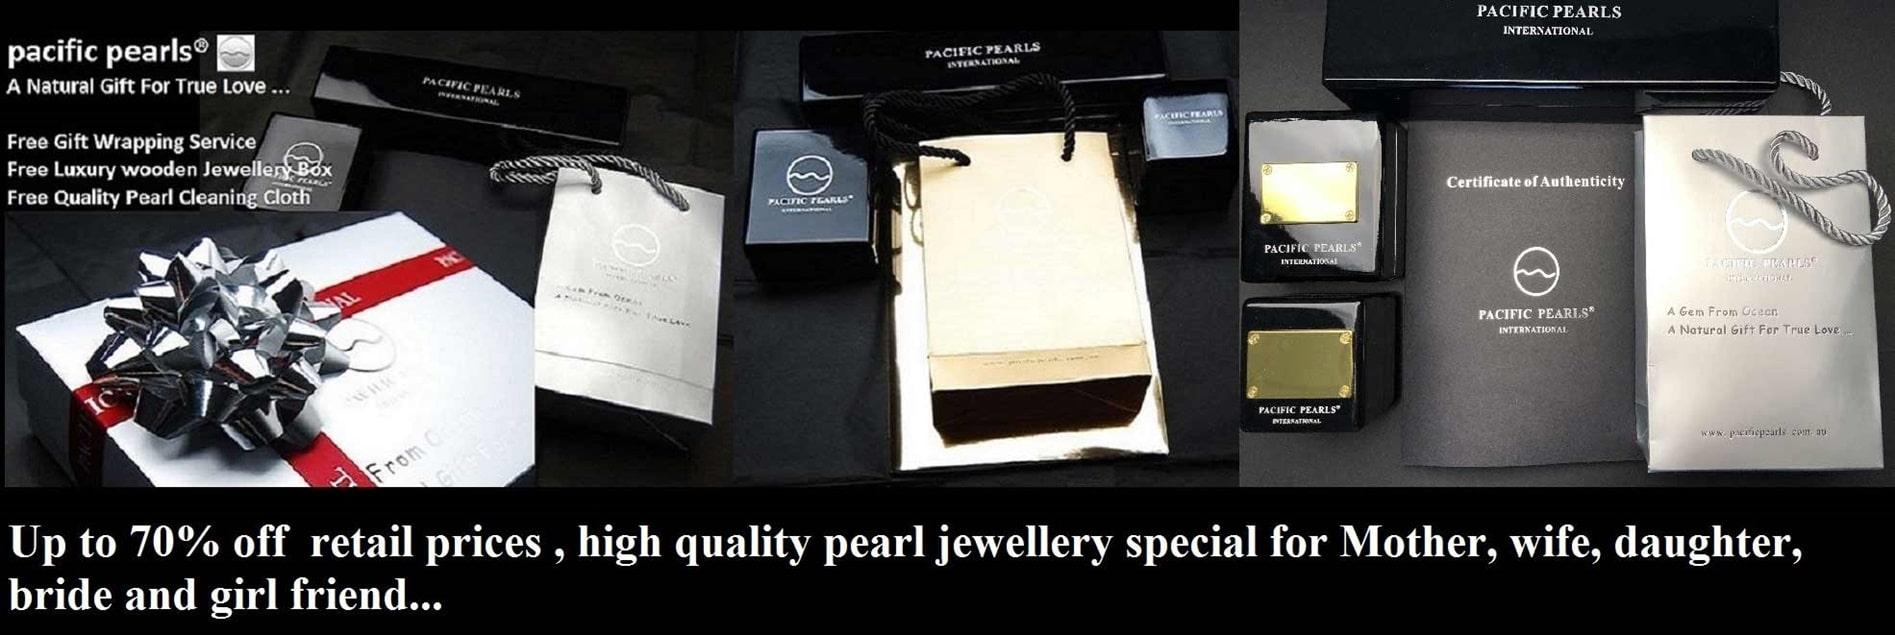 Pacfic Pearls